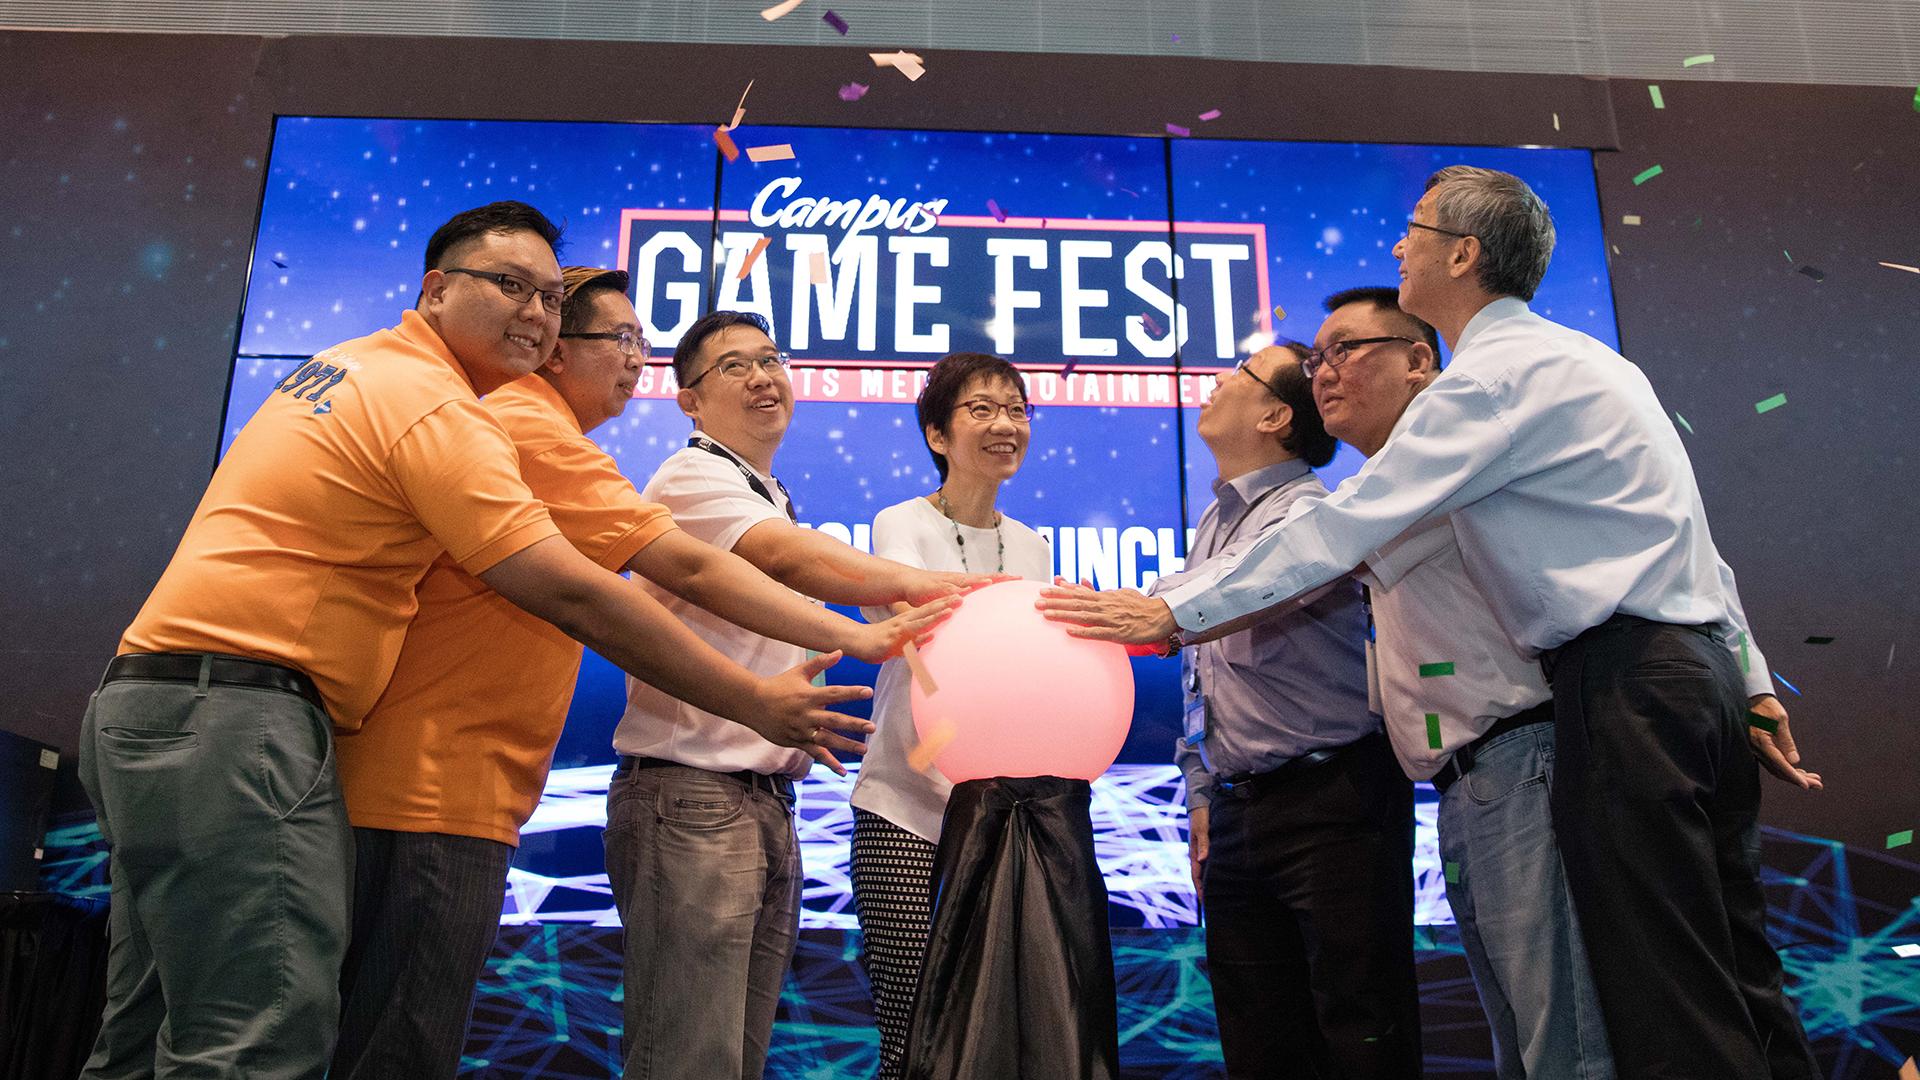 Campus Game Fest 2016 - Opening